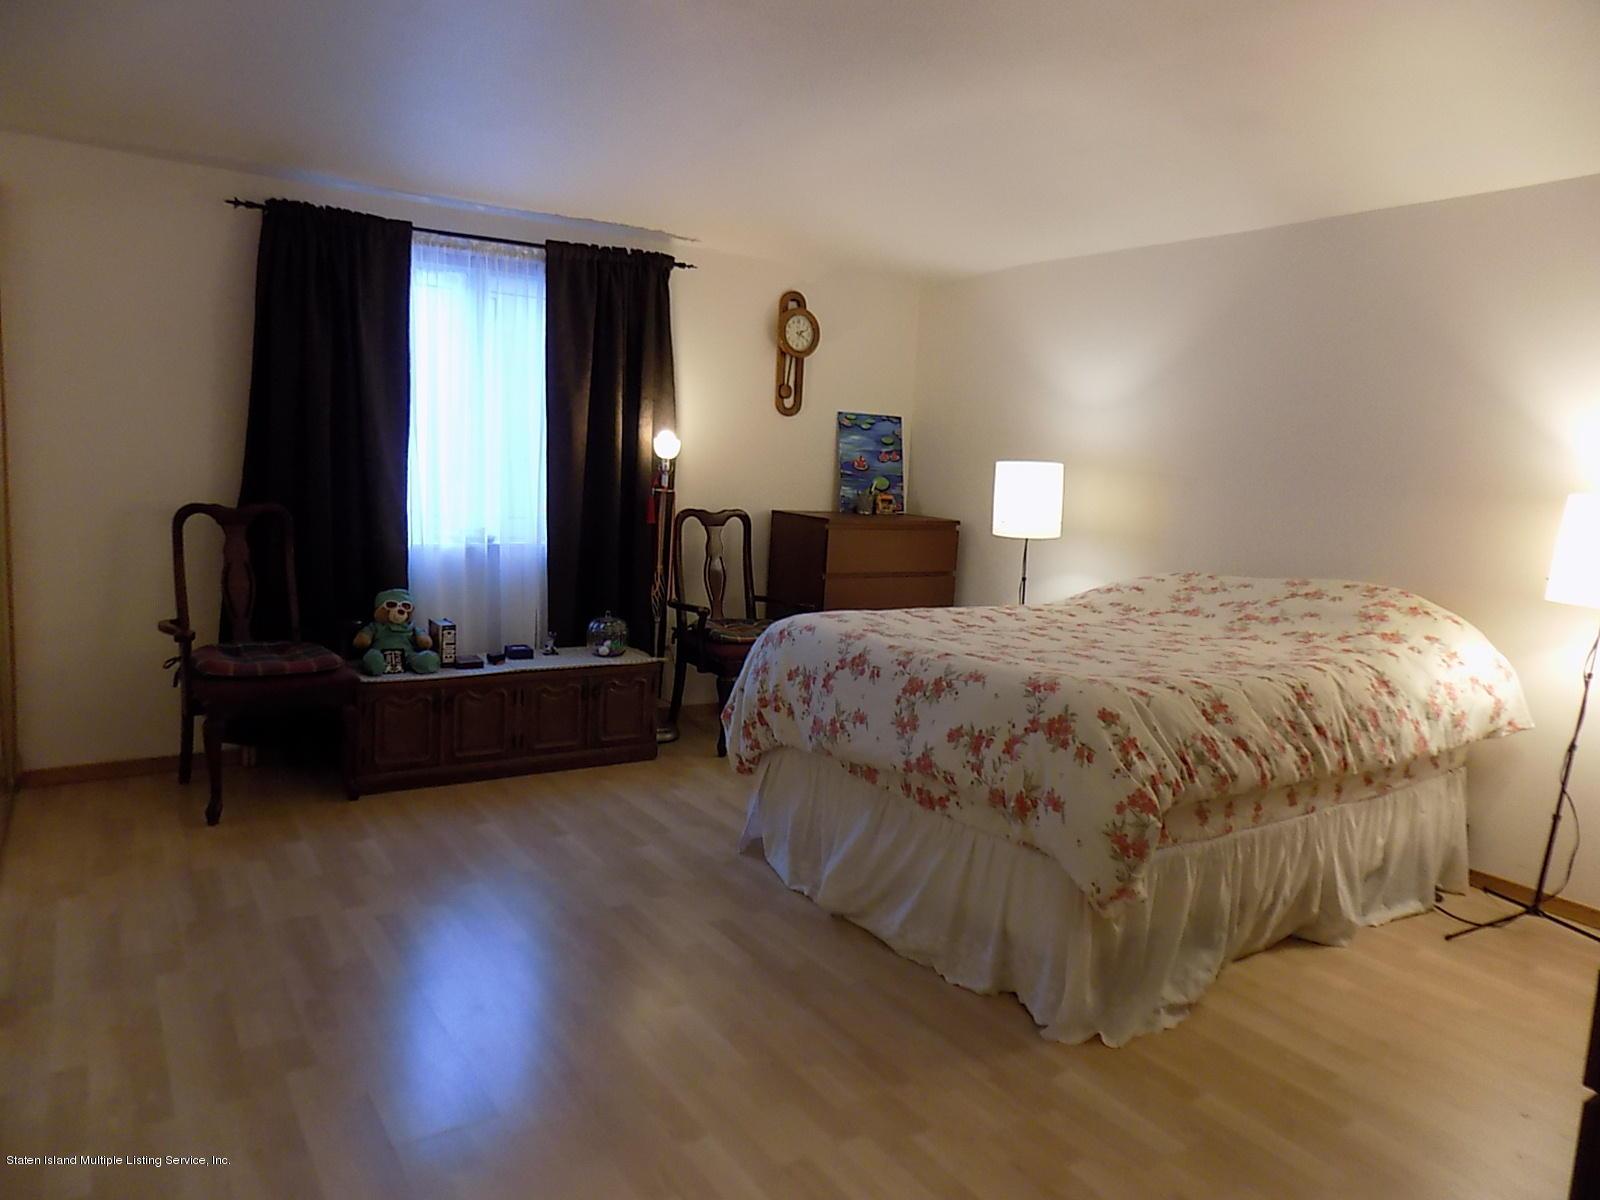 Single Family - Semi-Attached 85 Bogota Street  Staten Island, NY 10314, MLS-1126026-10